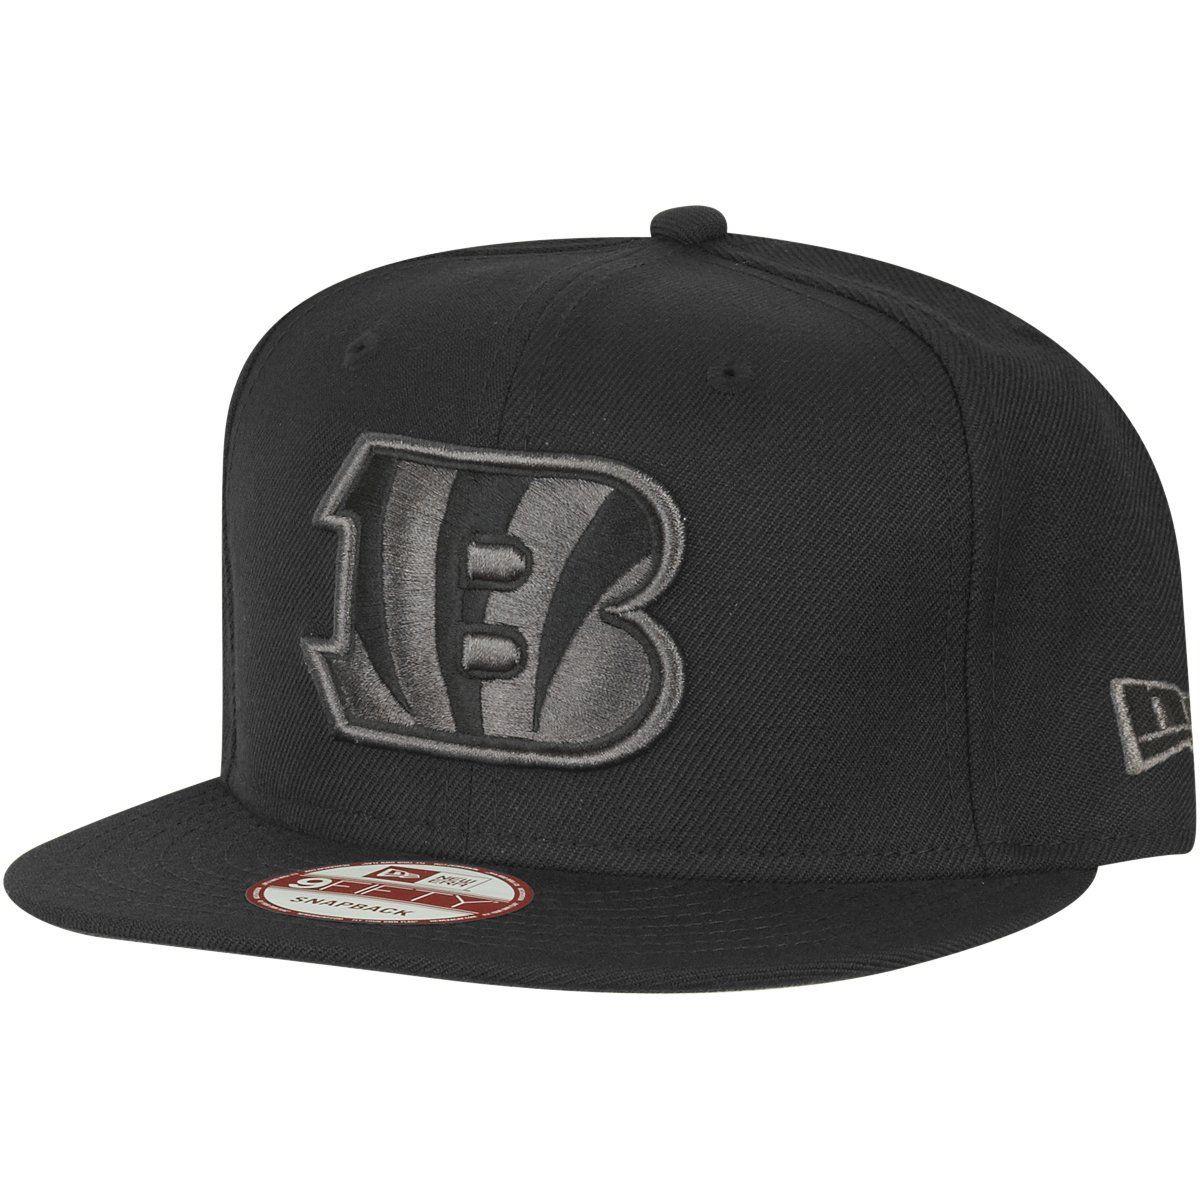 amfoo - New Era 9Fifty Snapback Cap - Cincinnati Bengals schwarz